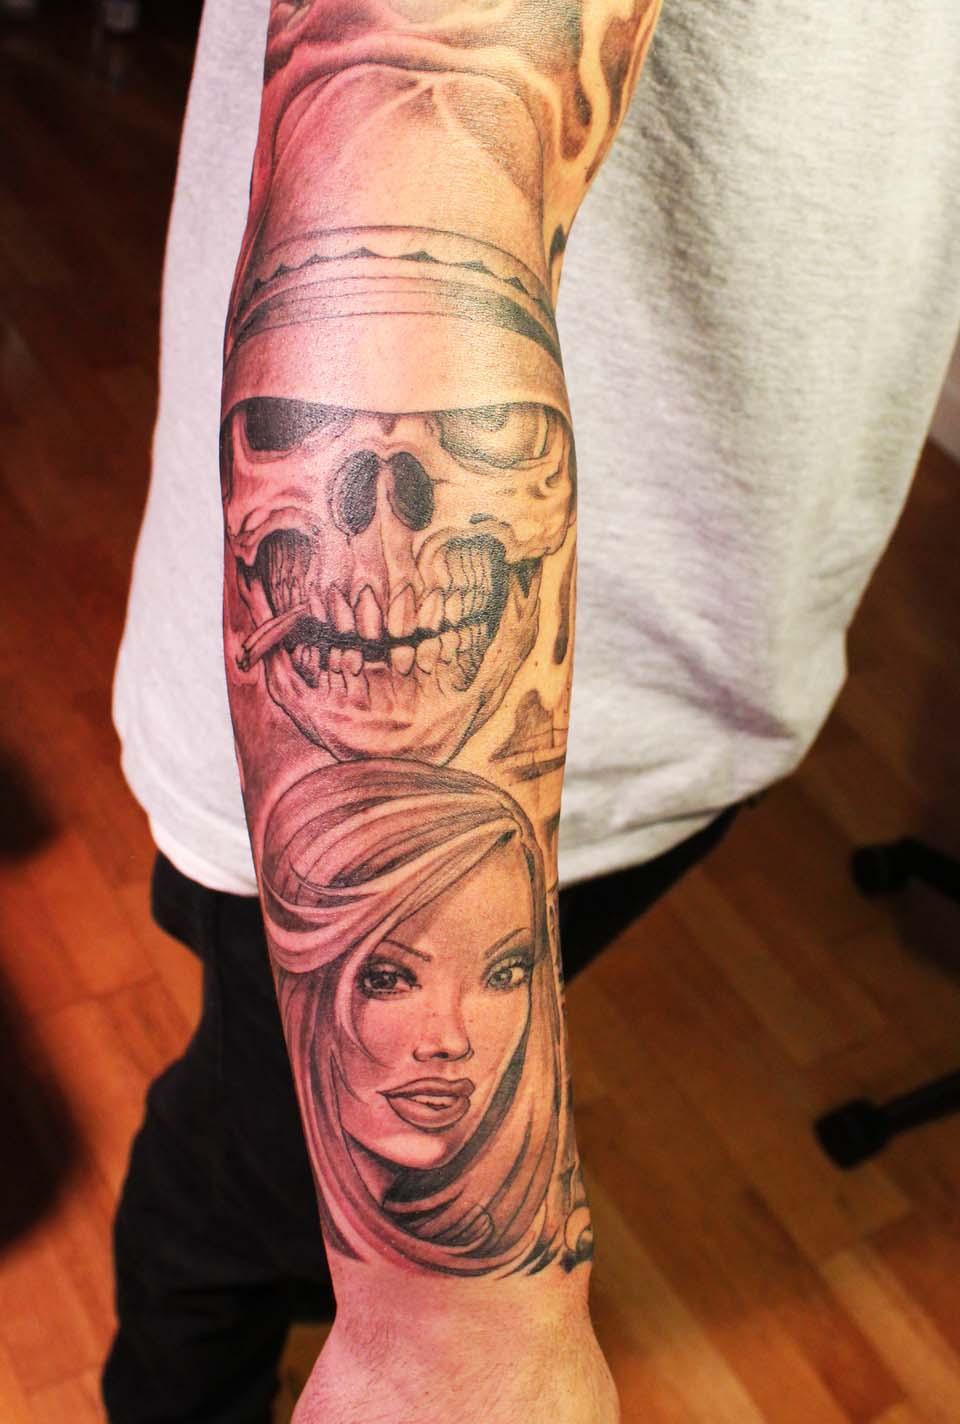 New Tattoo Design: New Tattoo Designs Today: NEW YORK